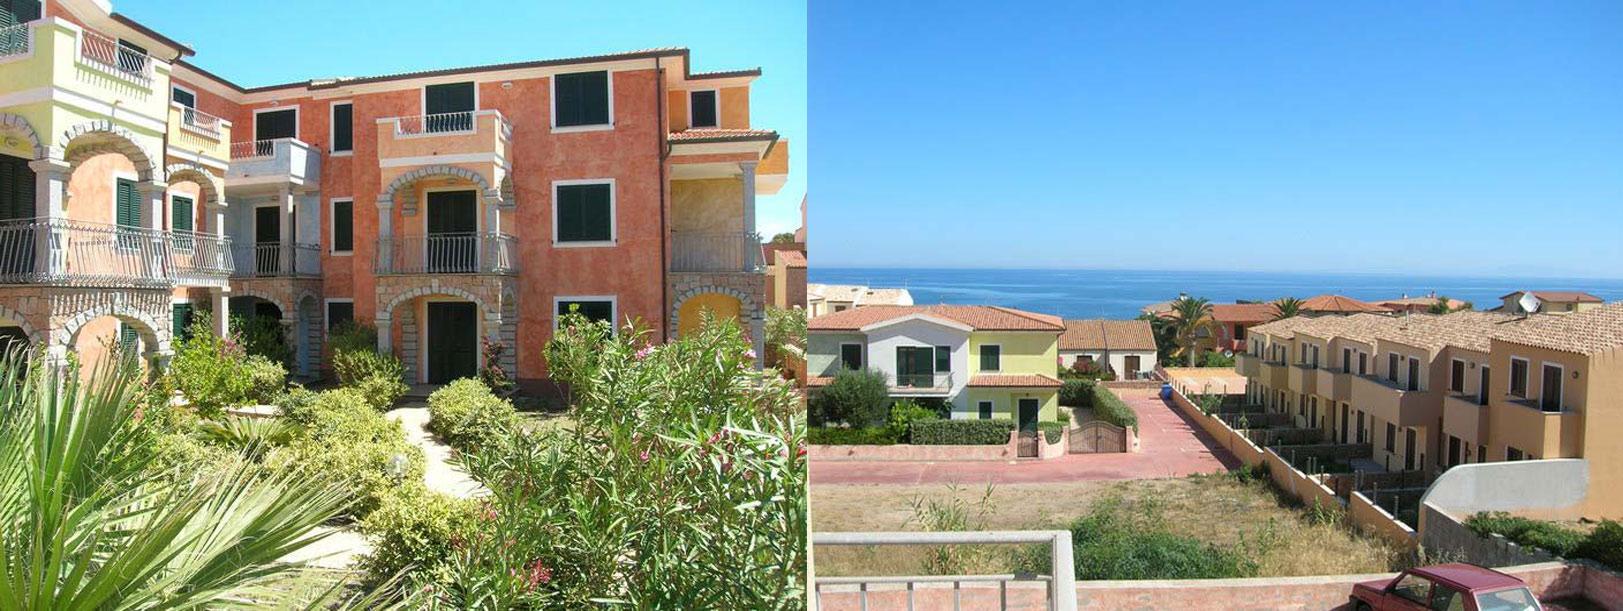 Vendita appartamenti Valledoria